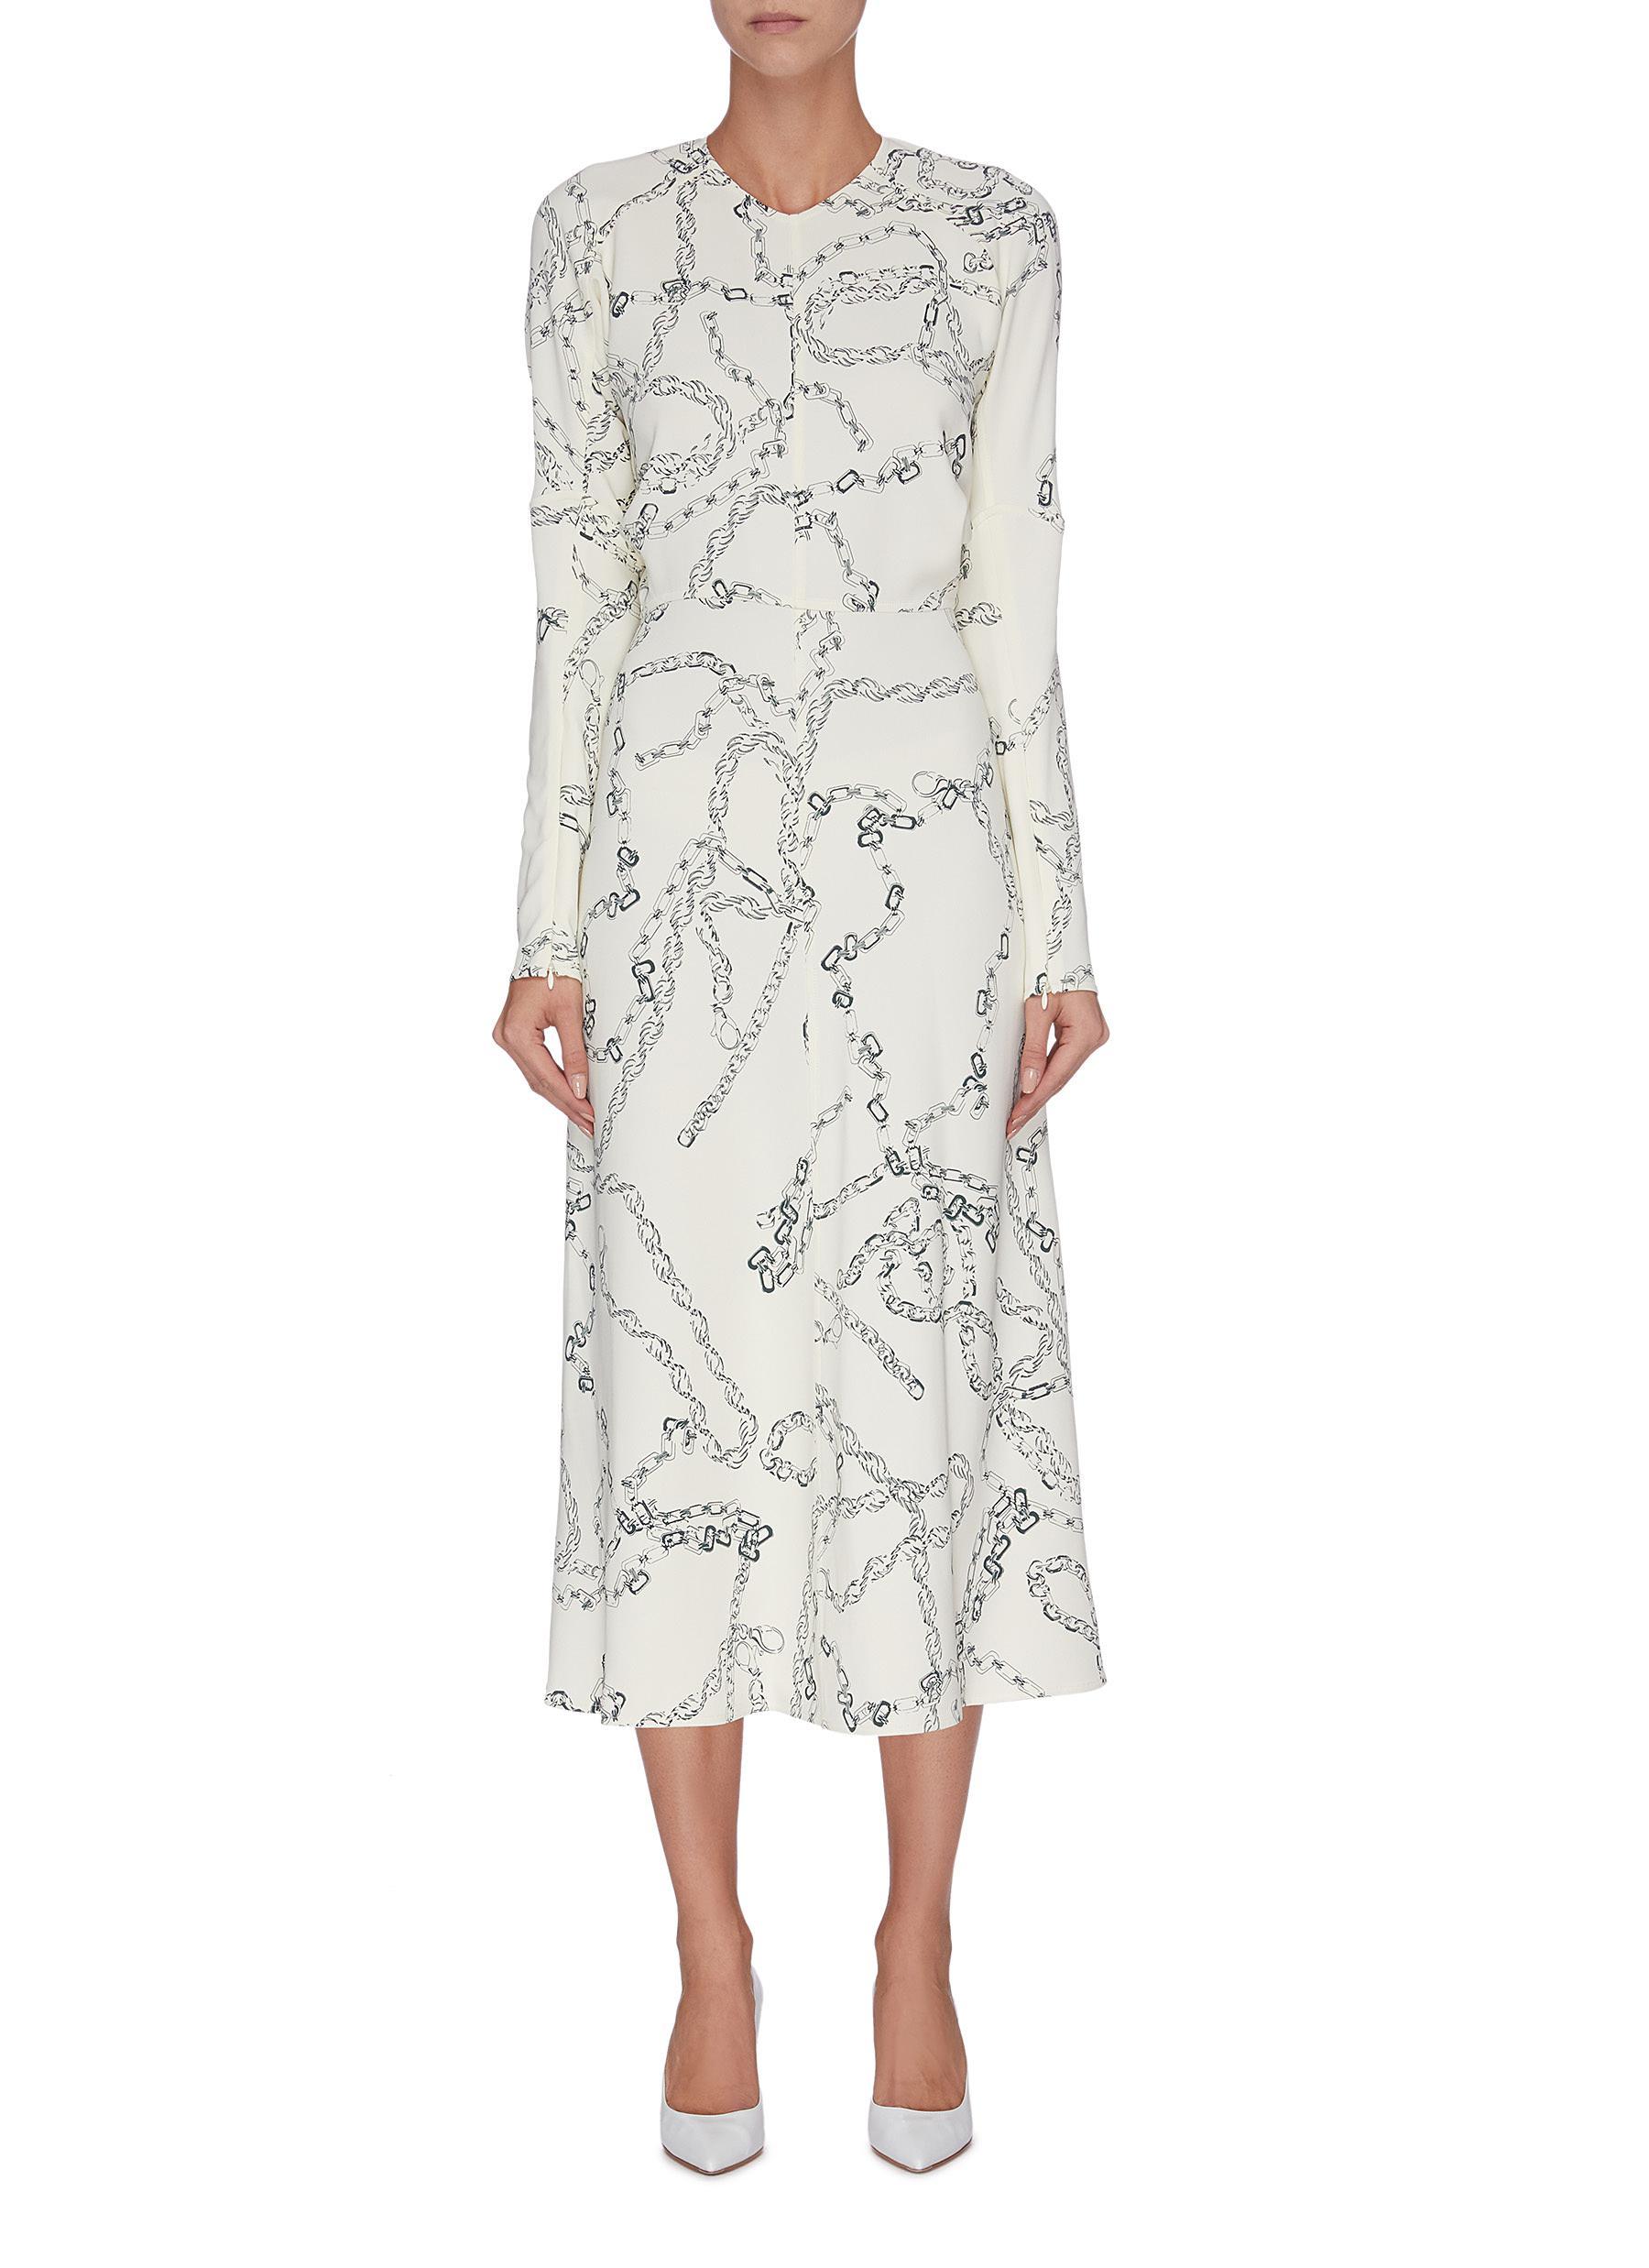 Dolman sleeves graphic print midi dress by Victoria Beckham